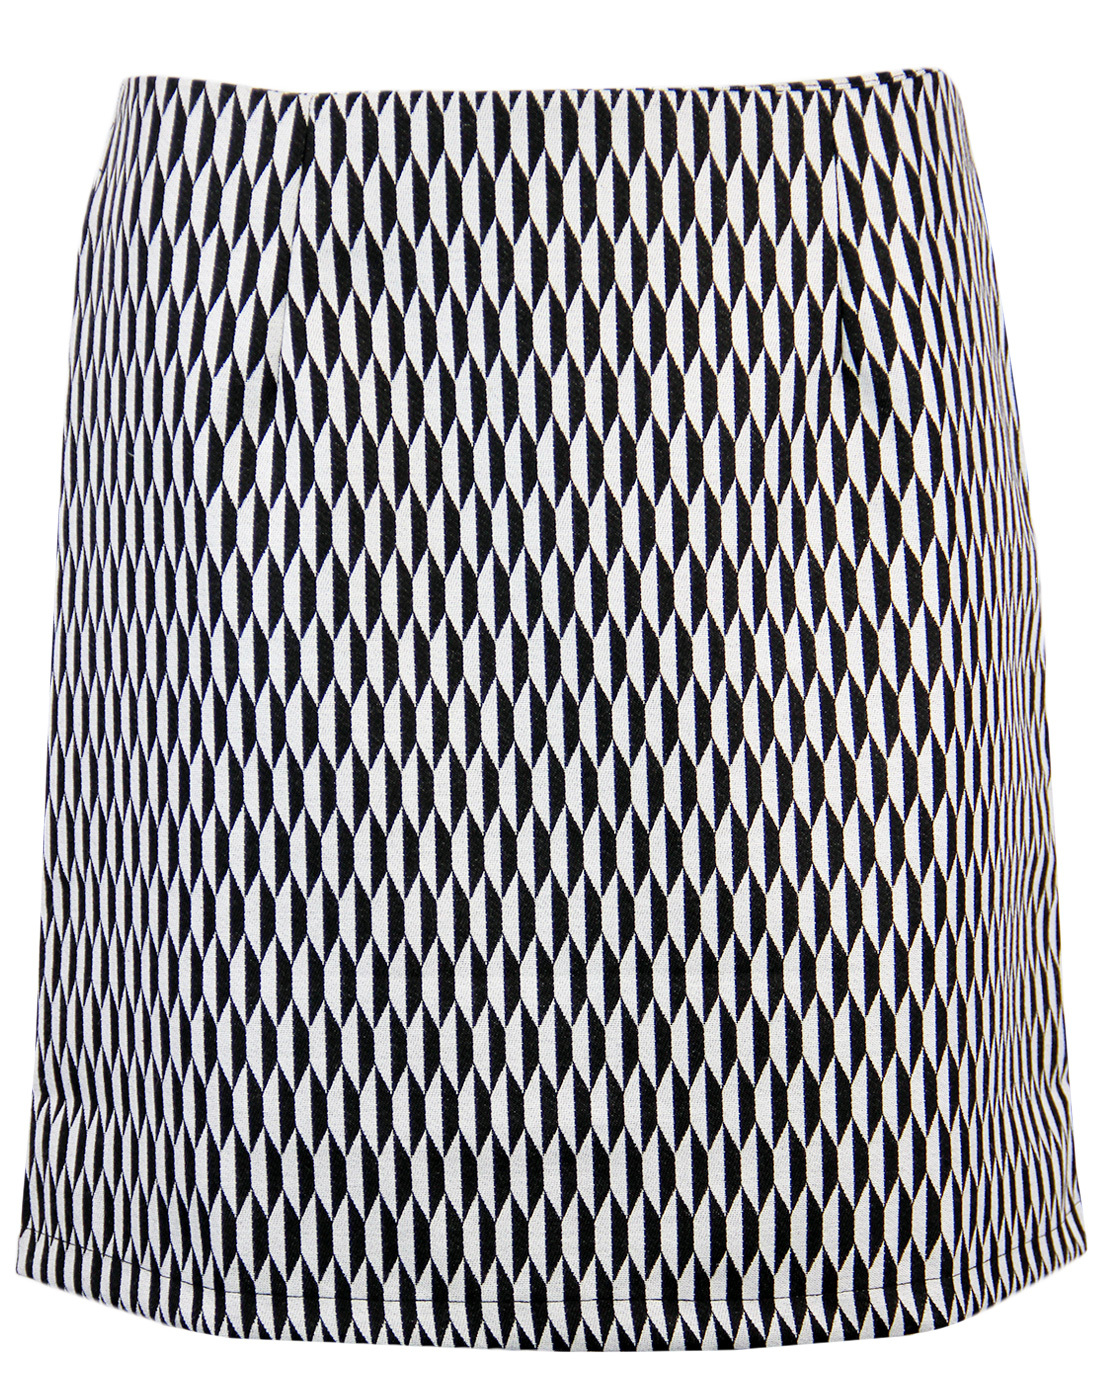 Karina MADCAP ENGLAND Retro Mod Op Art Mini Skirt